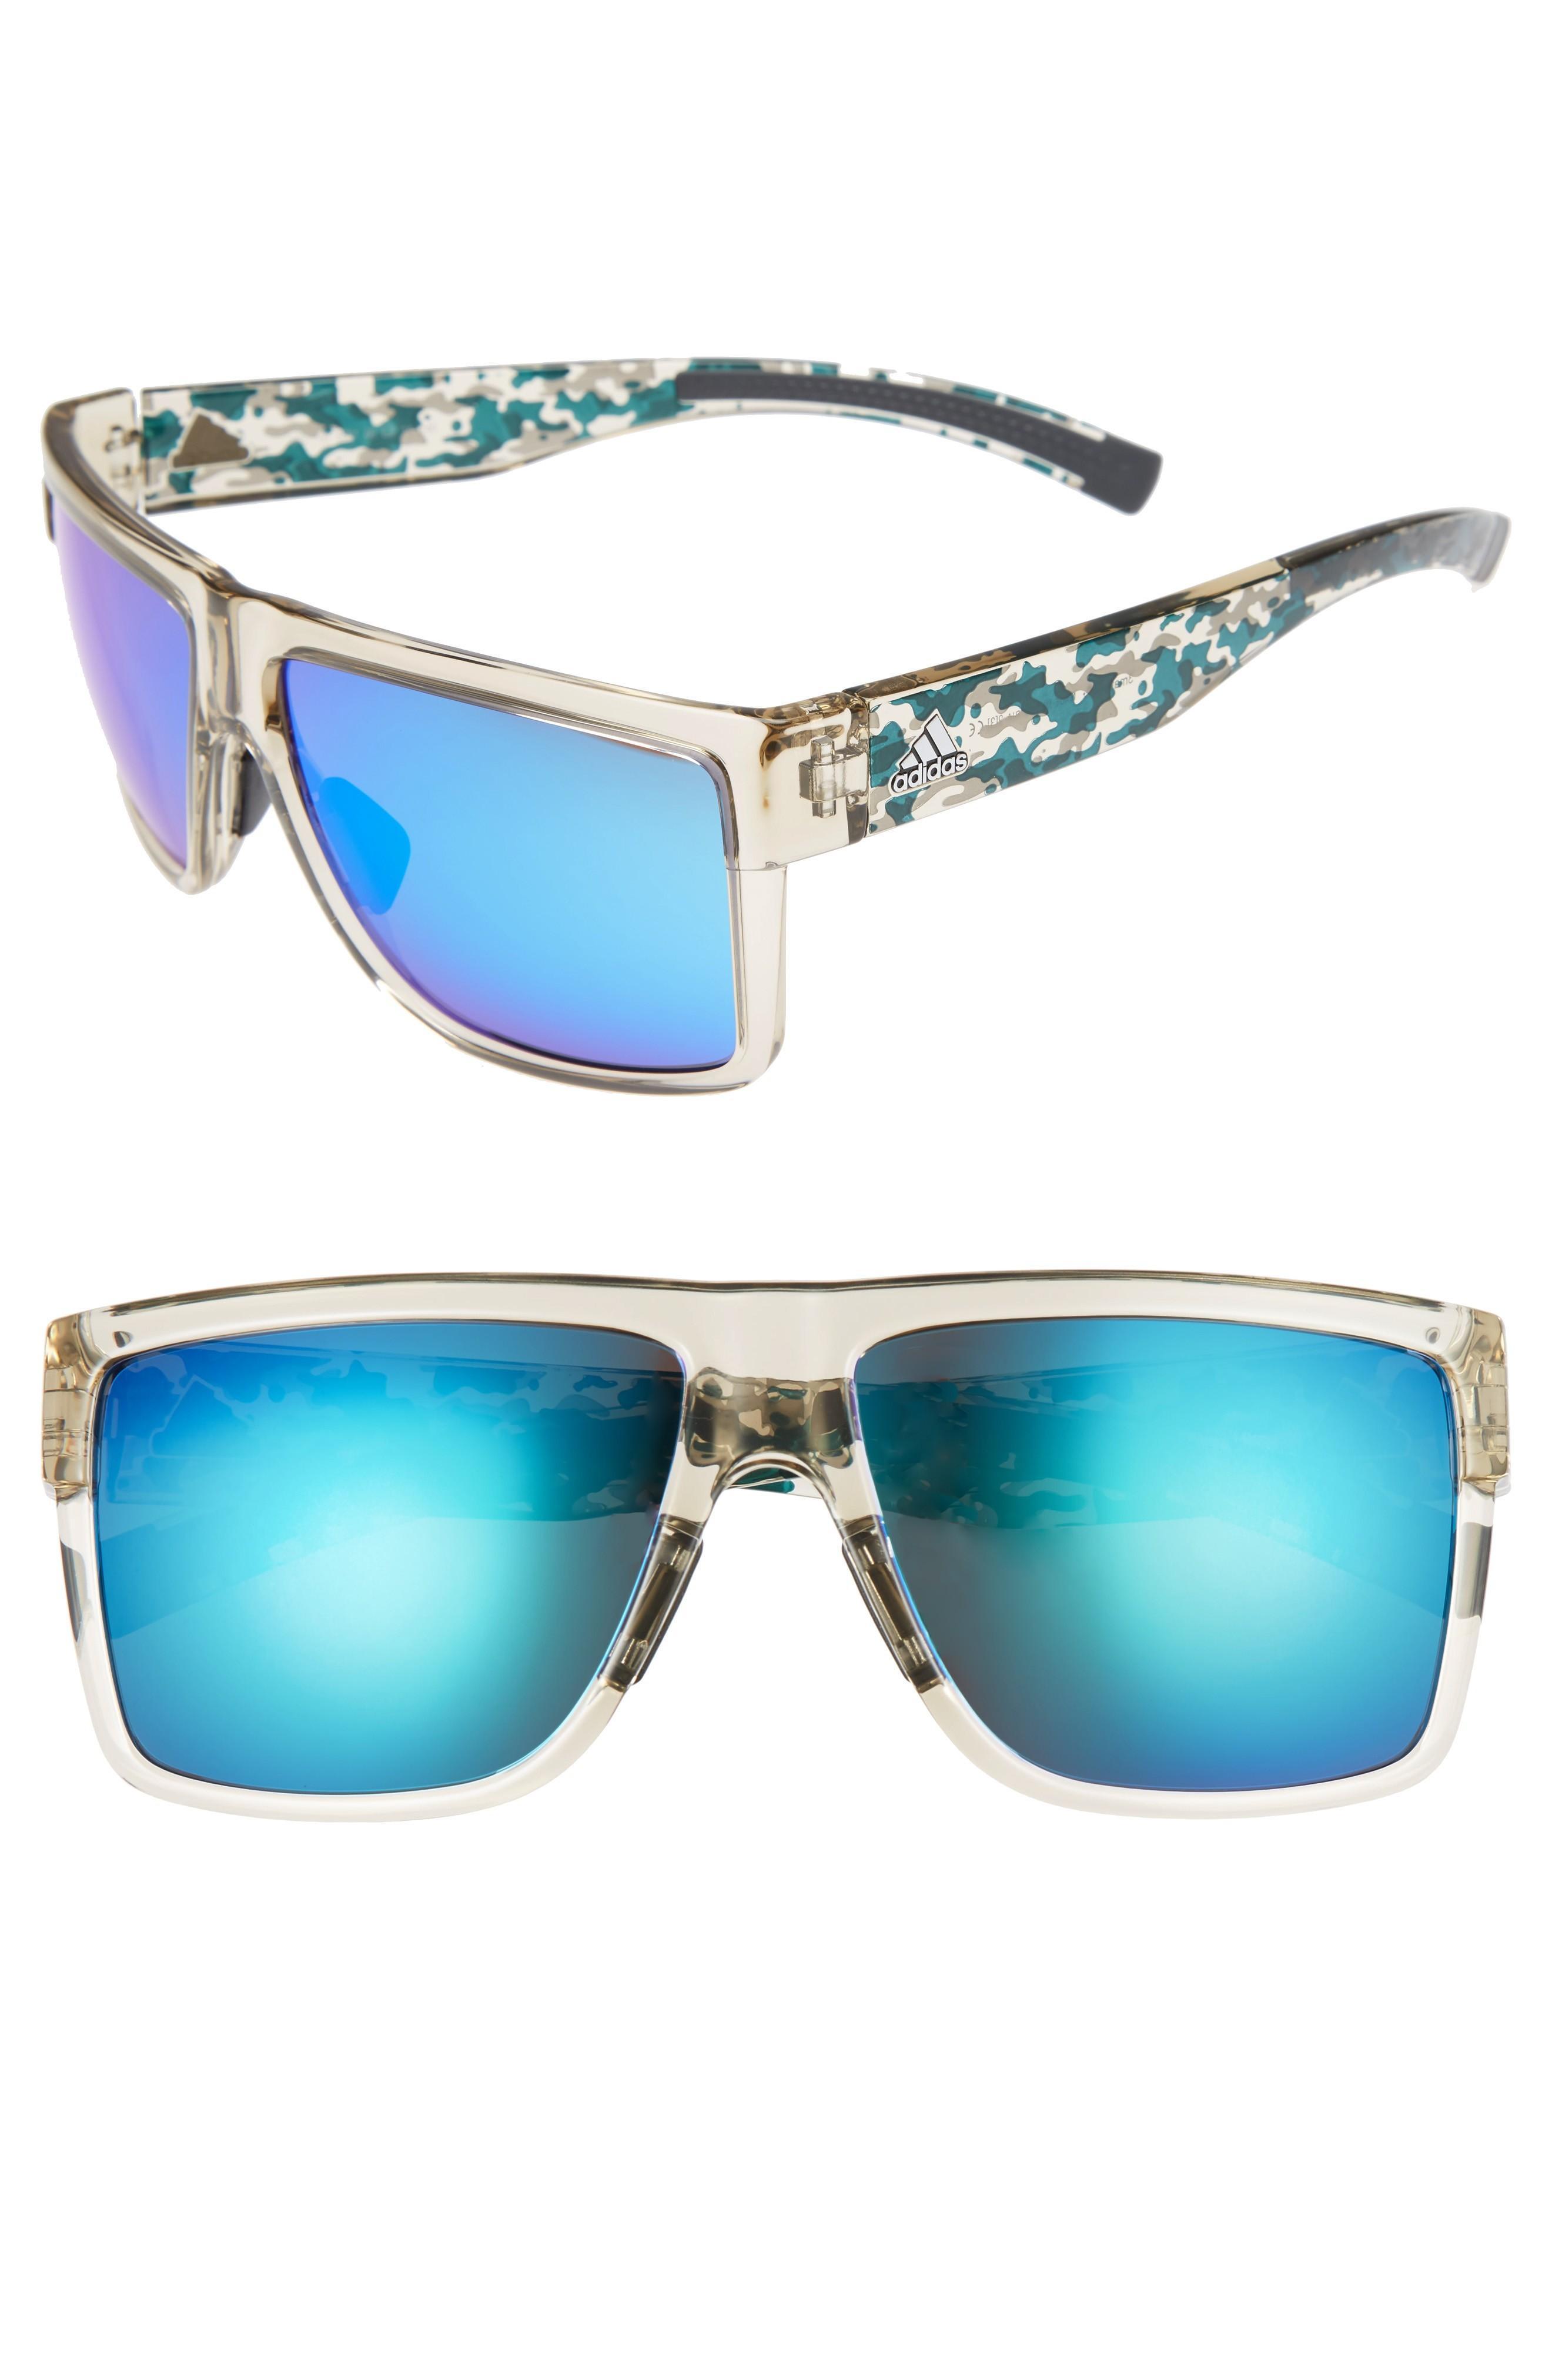 2dbd9f2059025 Adidas Originals 3Matic 60Mm Sunglasses - Clear Brown Camo  Blue ...